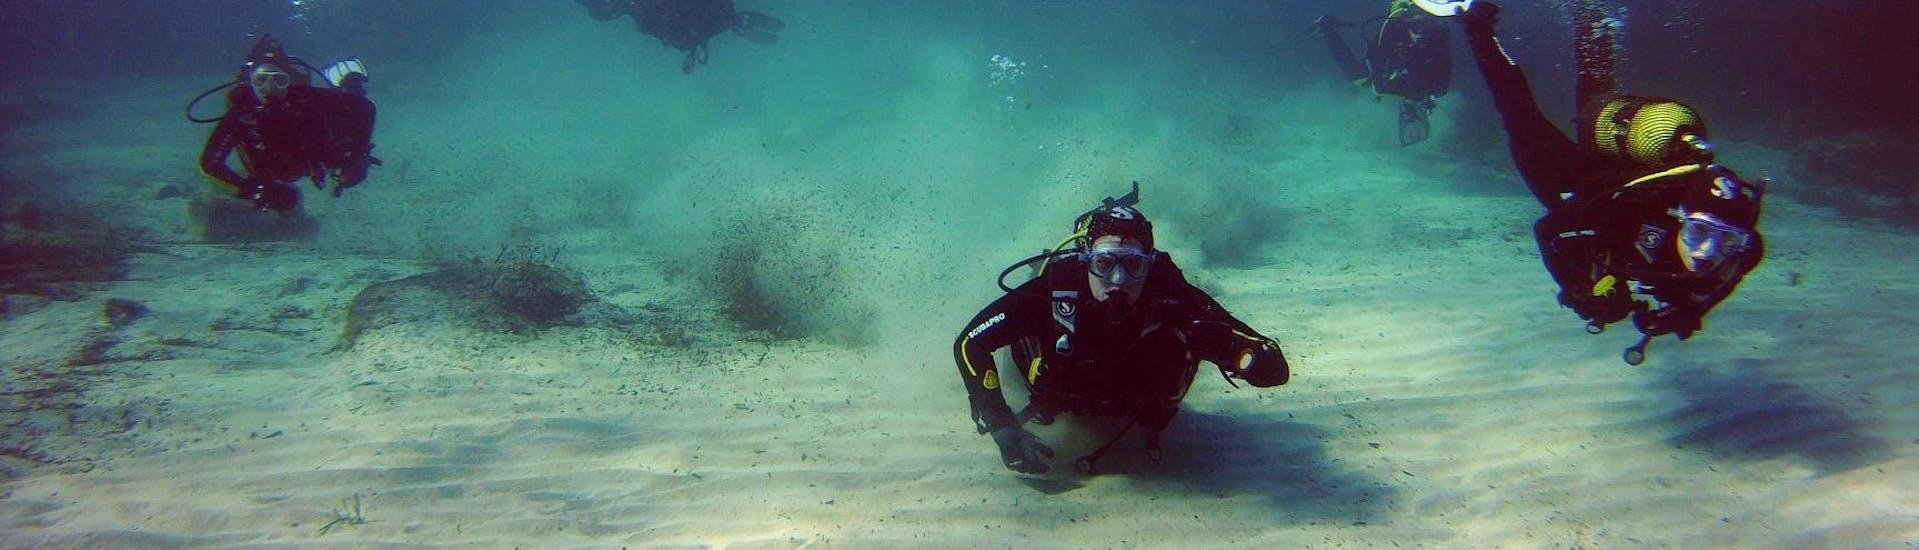 Curso de Buceo para Principiantes - PADI Open Water Diver